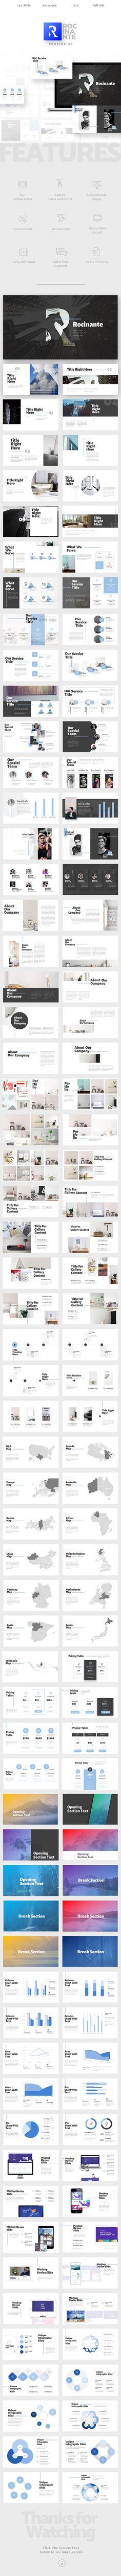 Rocinante Clean PowerPoint Template - Creative PowerPoint Templates